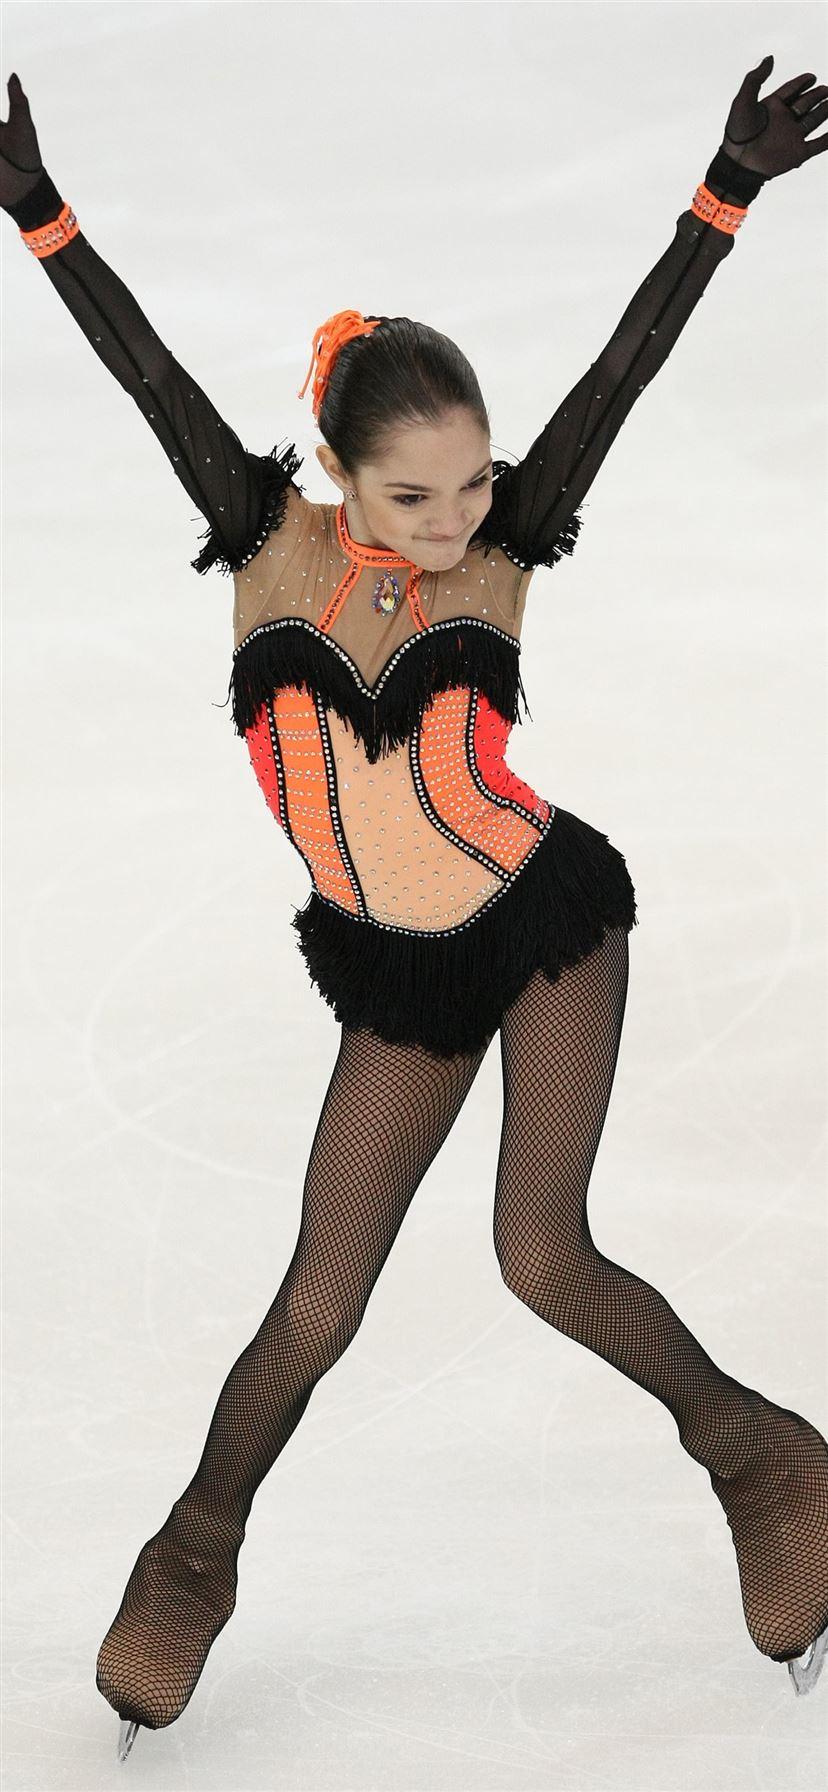 Best Figure Skating Celebrity Iphone 11 Wallpapers Hd Ilikewallpaper